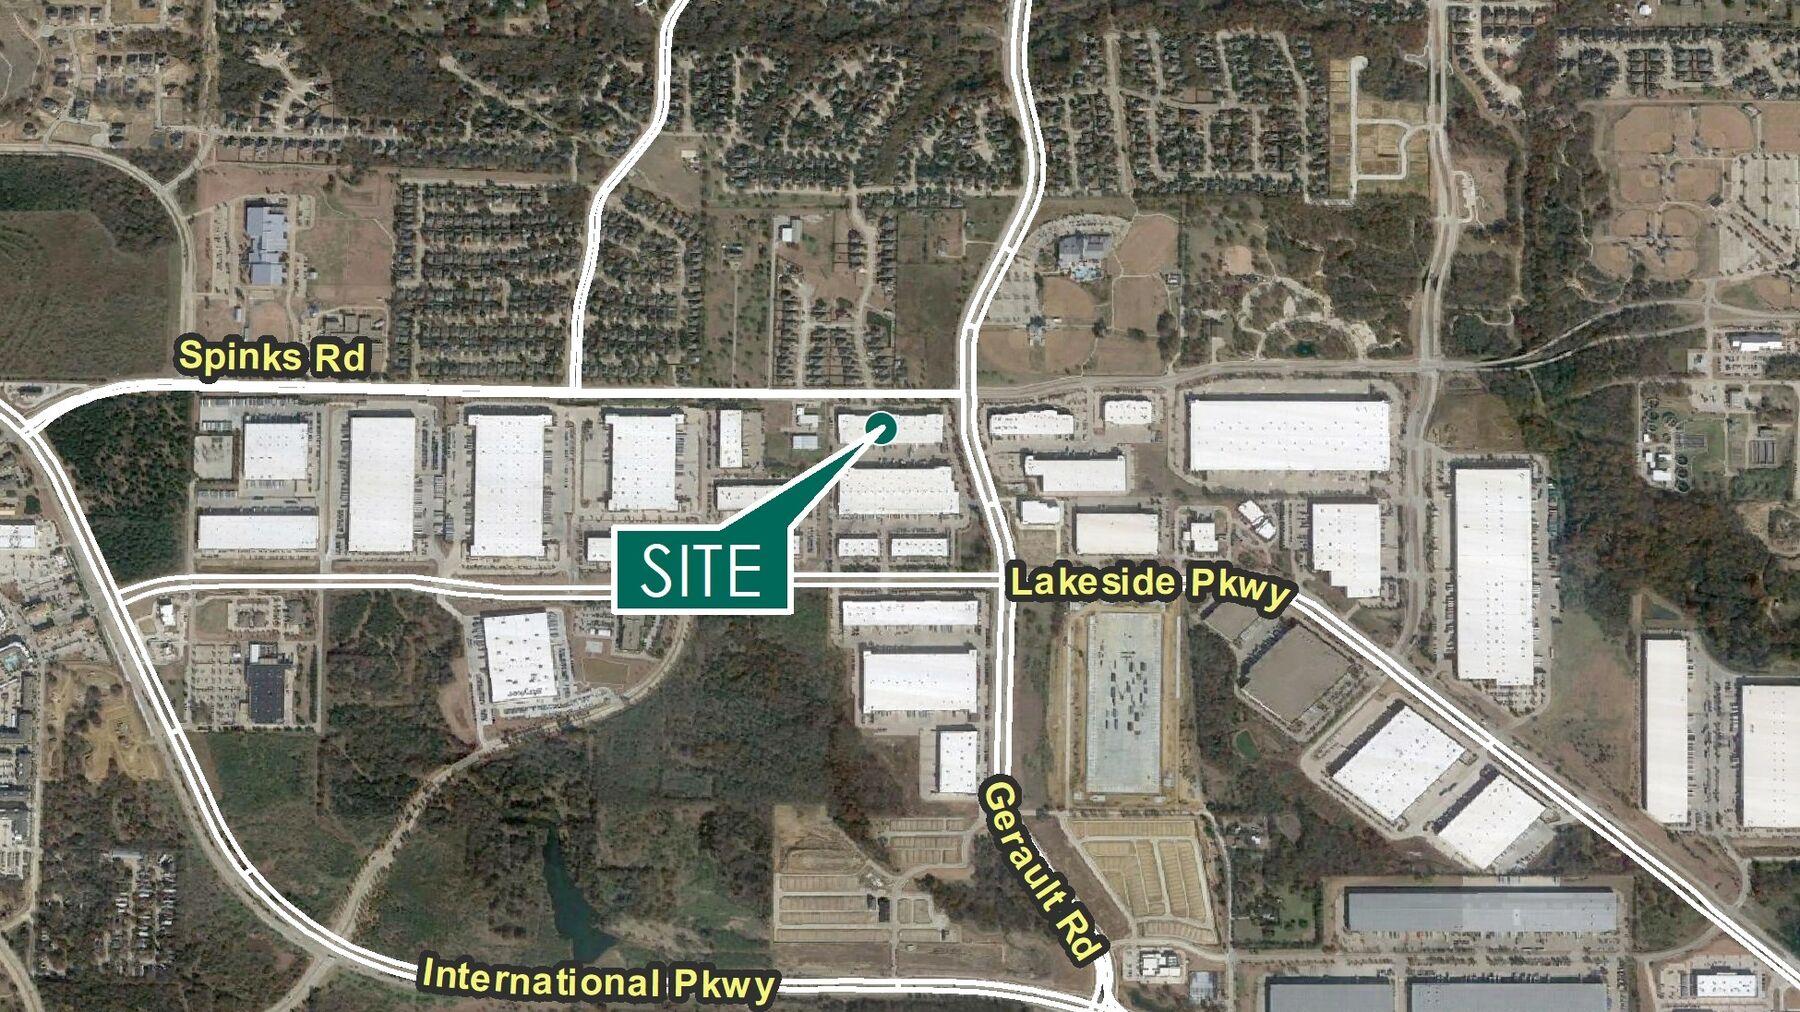 DPM-Prologis-Flower-Mound-5-DAL01405-1200-Lakeside-Parkway_AerialMap.jpg